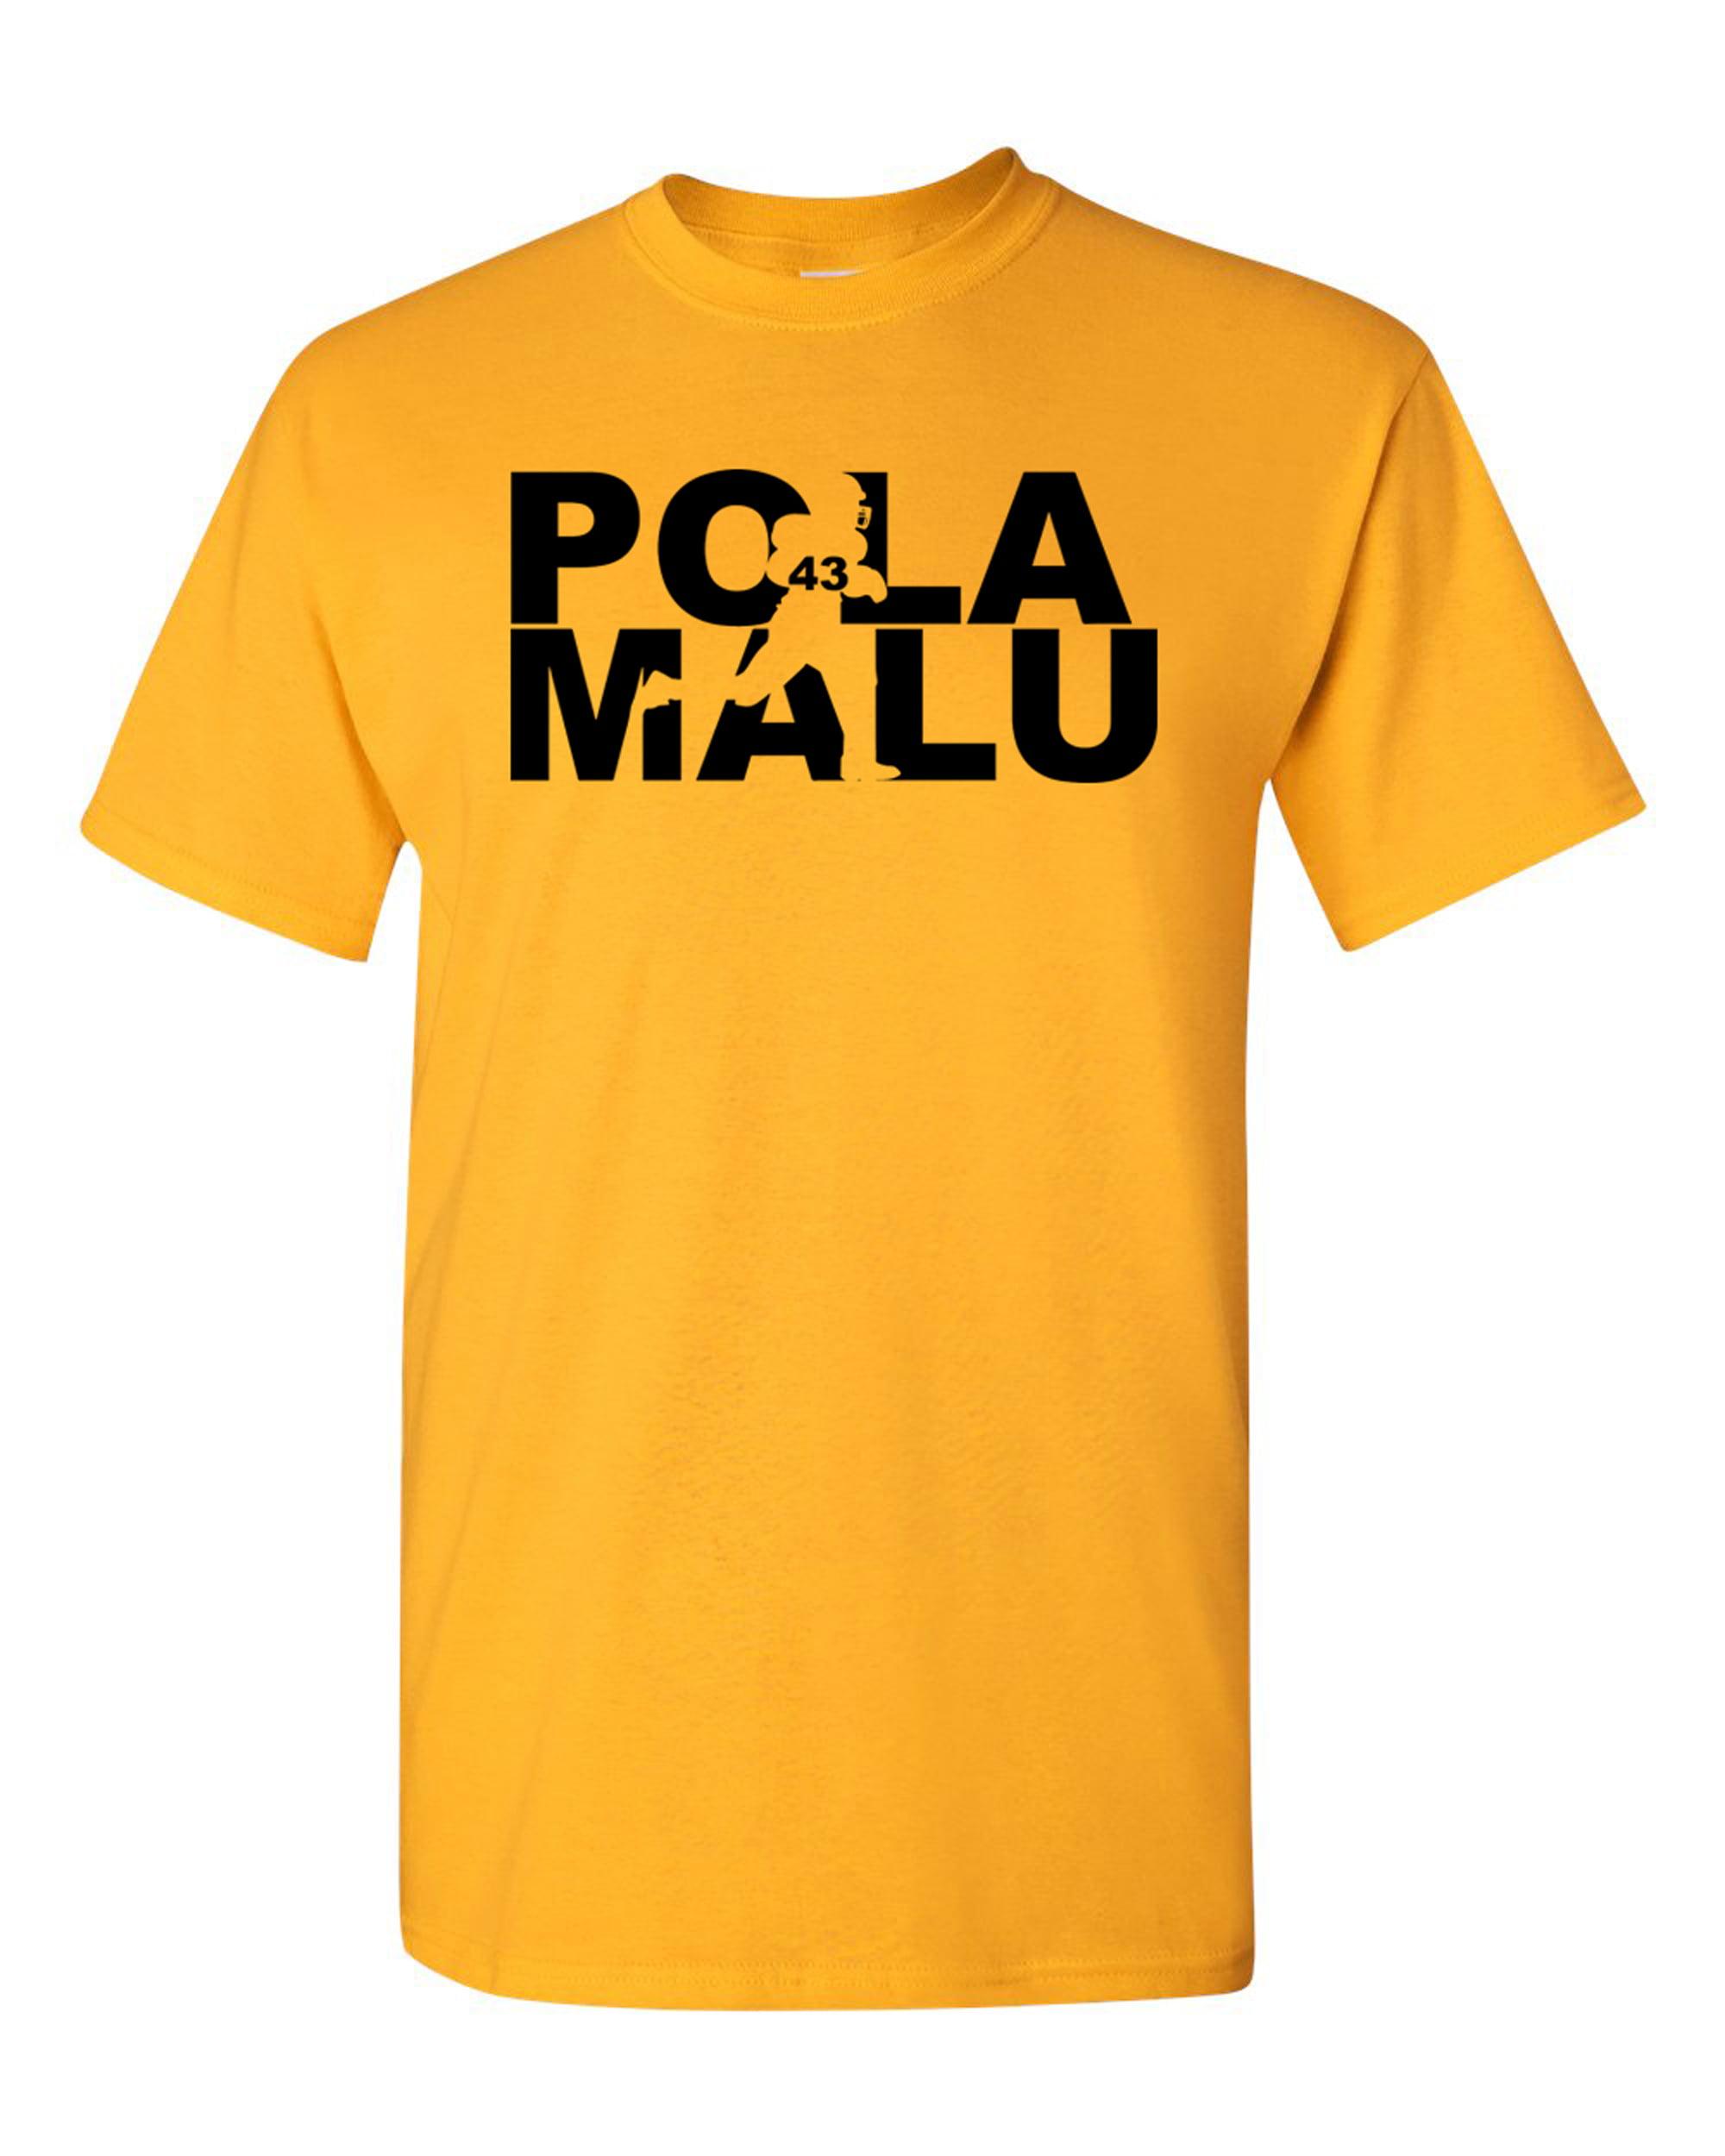 Polamalu Fan Wear Football Sports Adult T-Shirt Tee